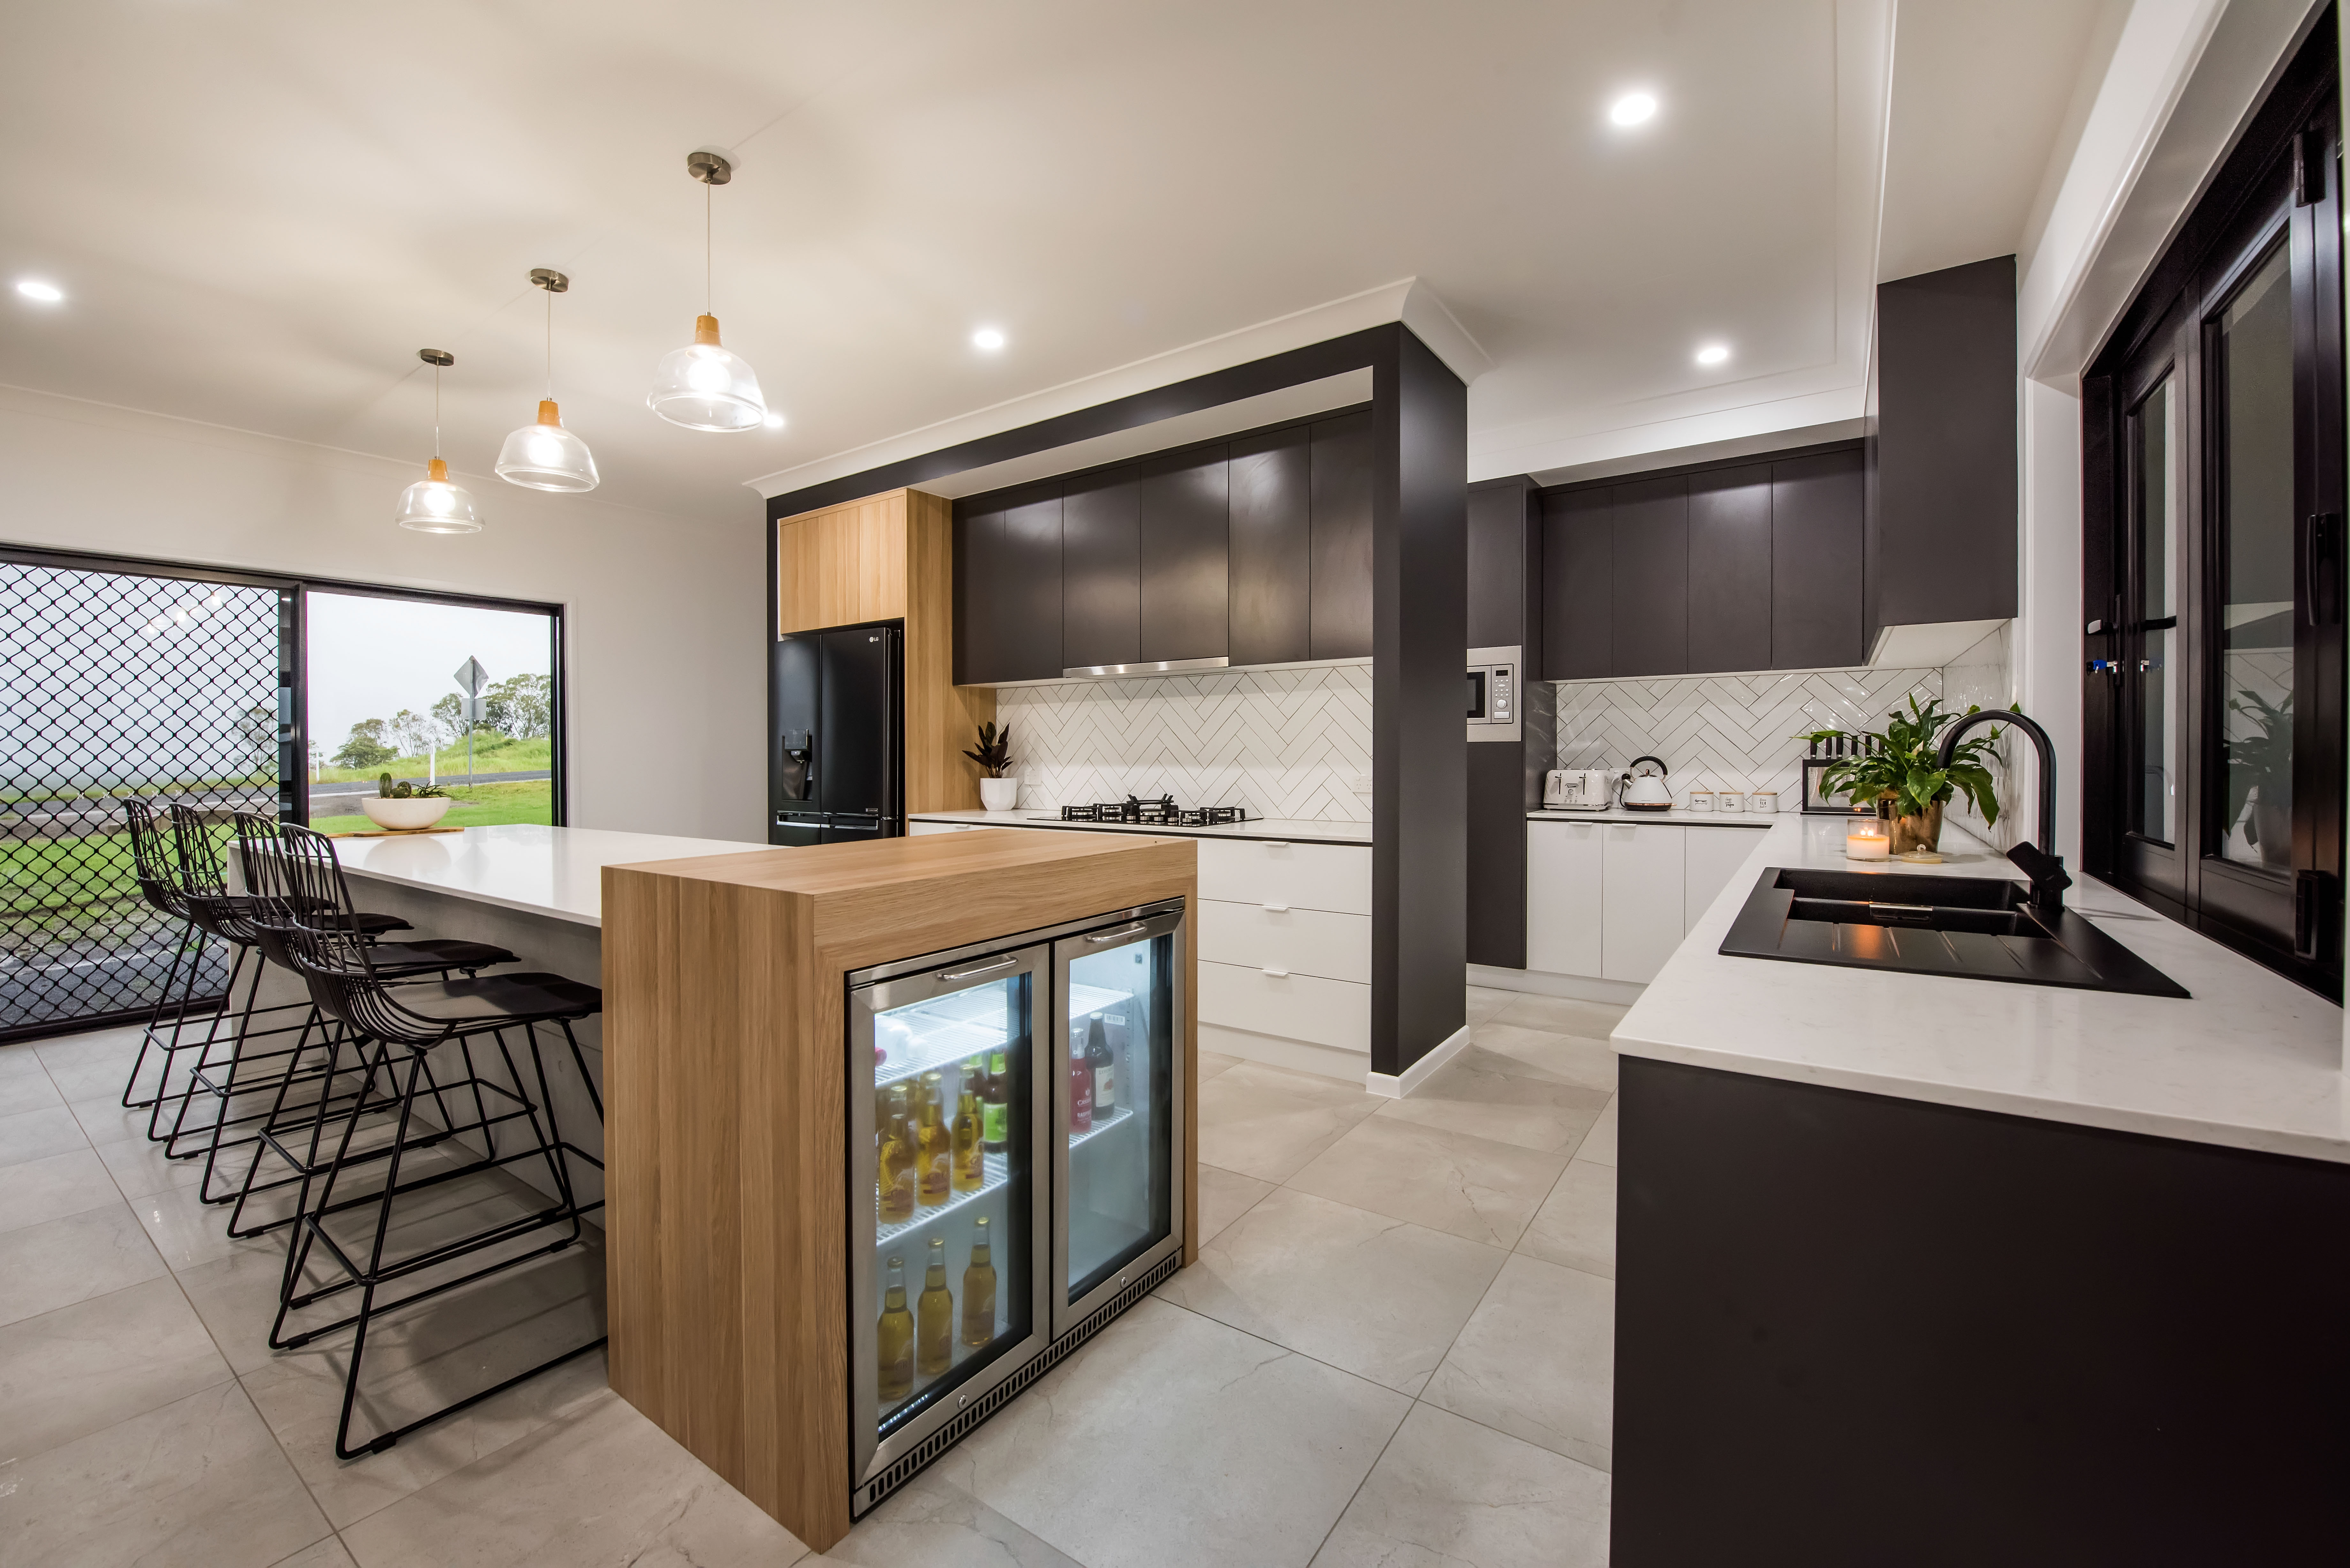 Kitchen 2 - Ultra